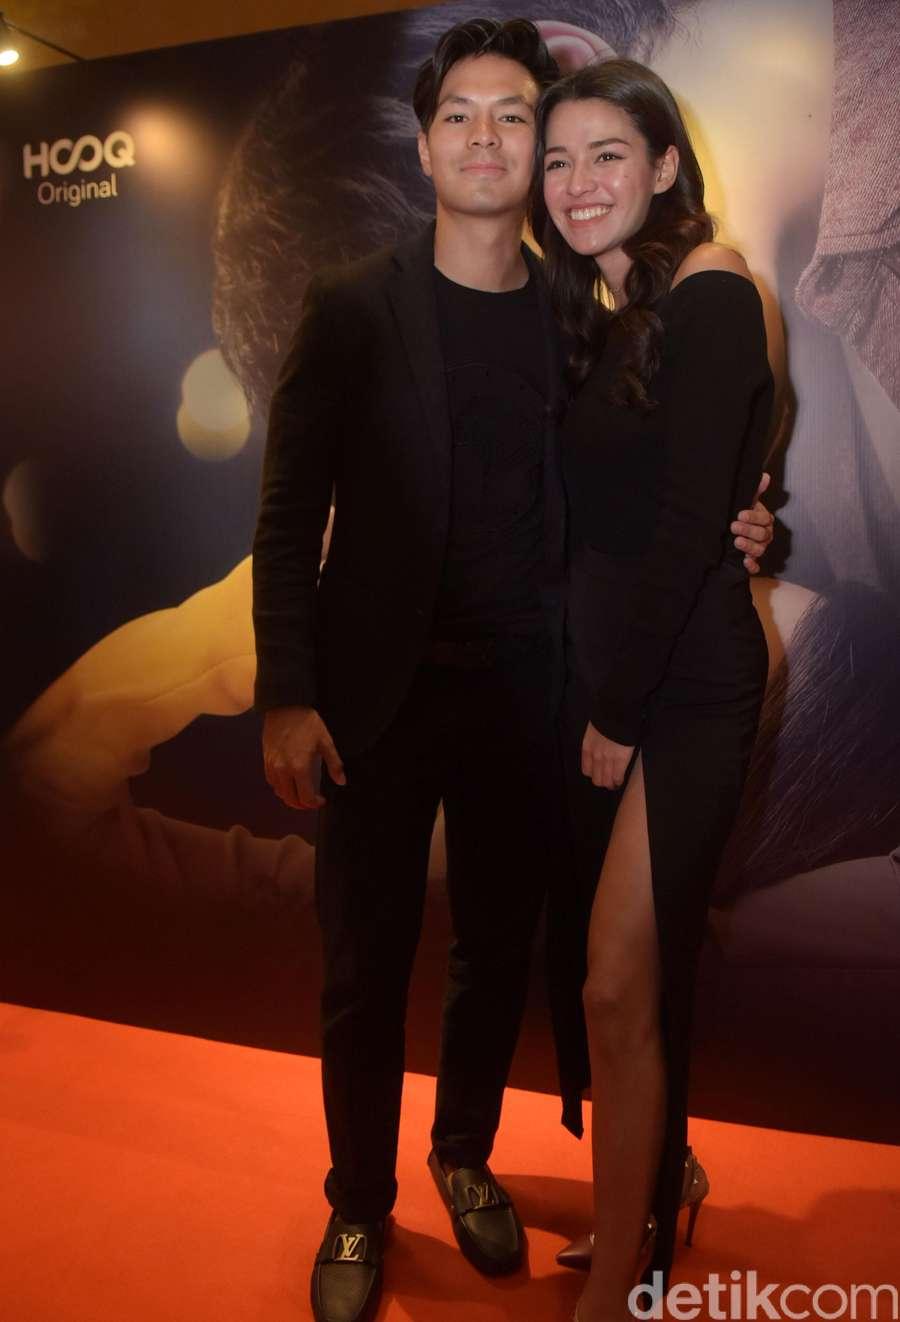 Hot Couple! Fero Walandouw dan Susan Sameh Tampil Serba Hitam